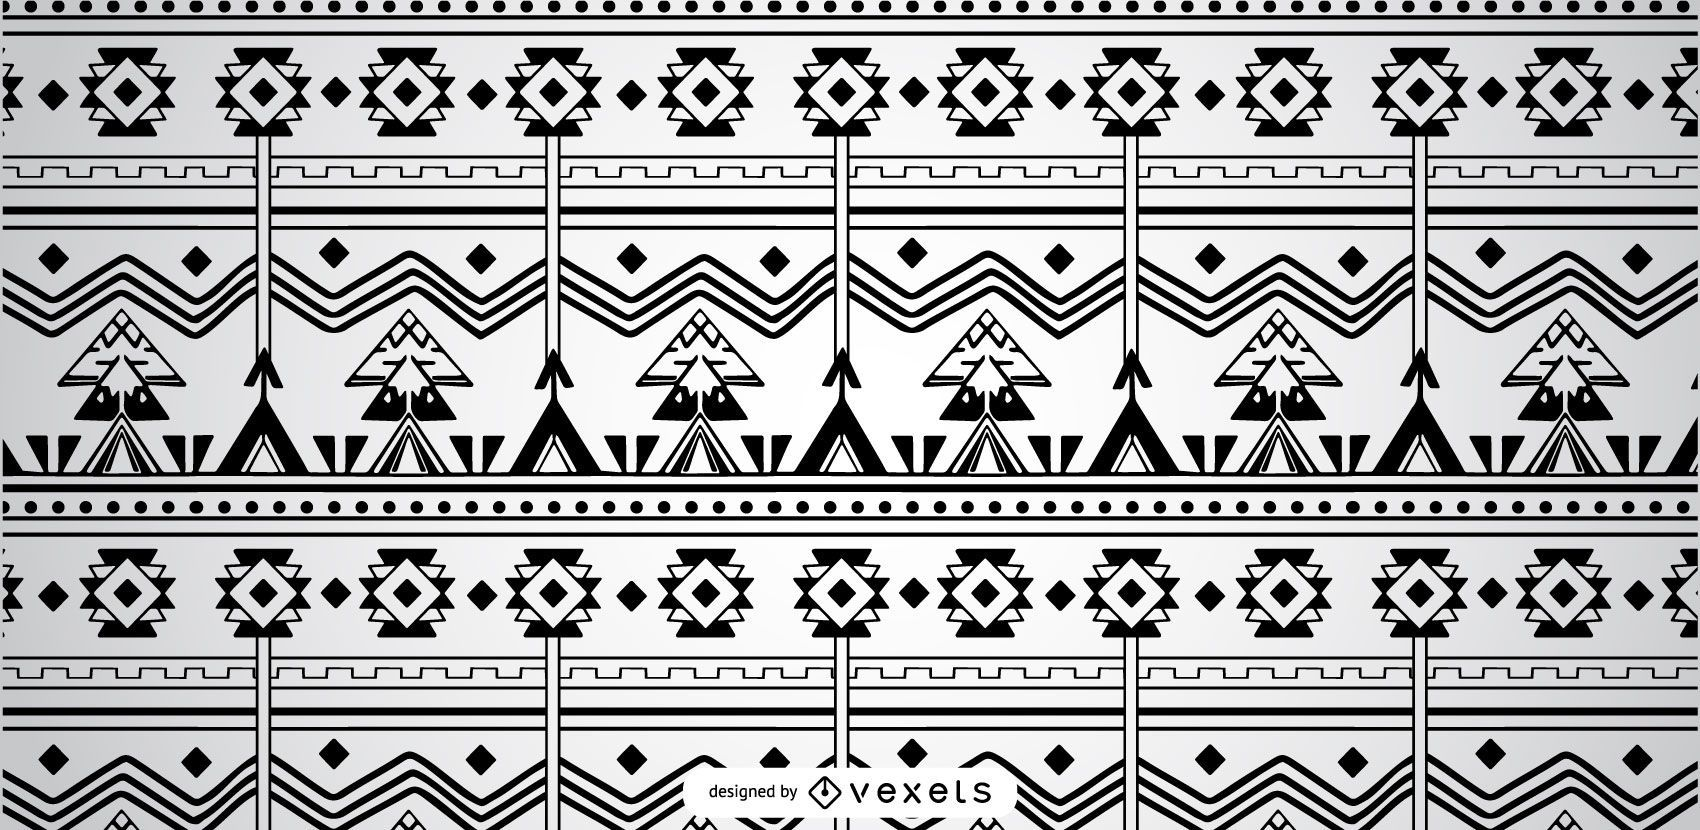 Patrón Azteca Geométrico Blanco Negro